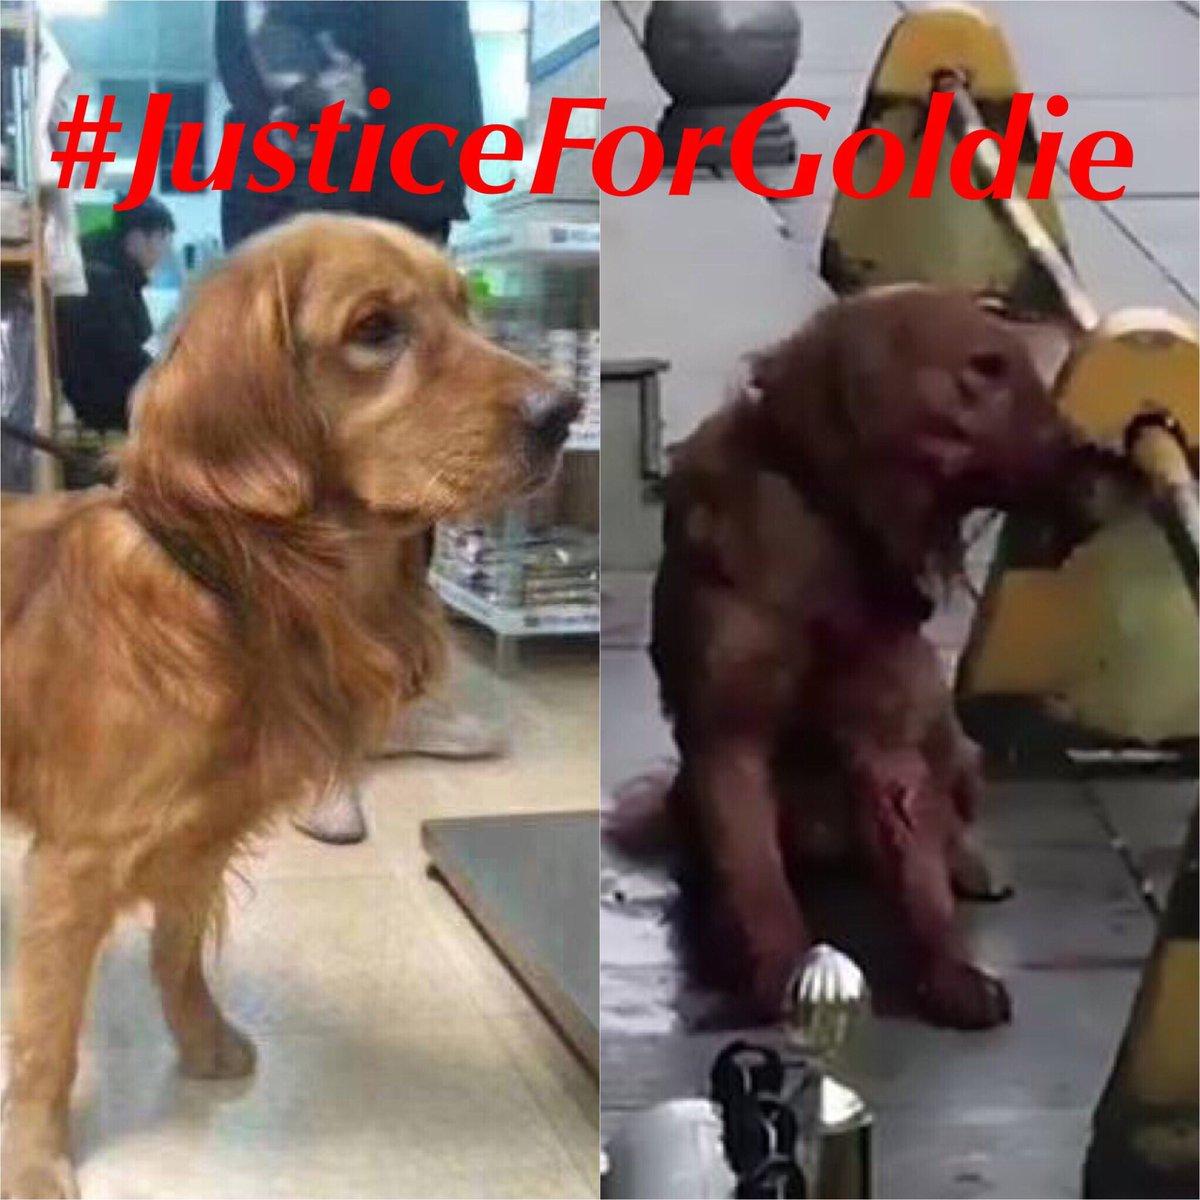 justiceforgoldie hashtag on Twitter